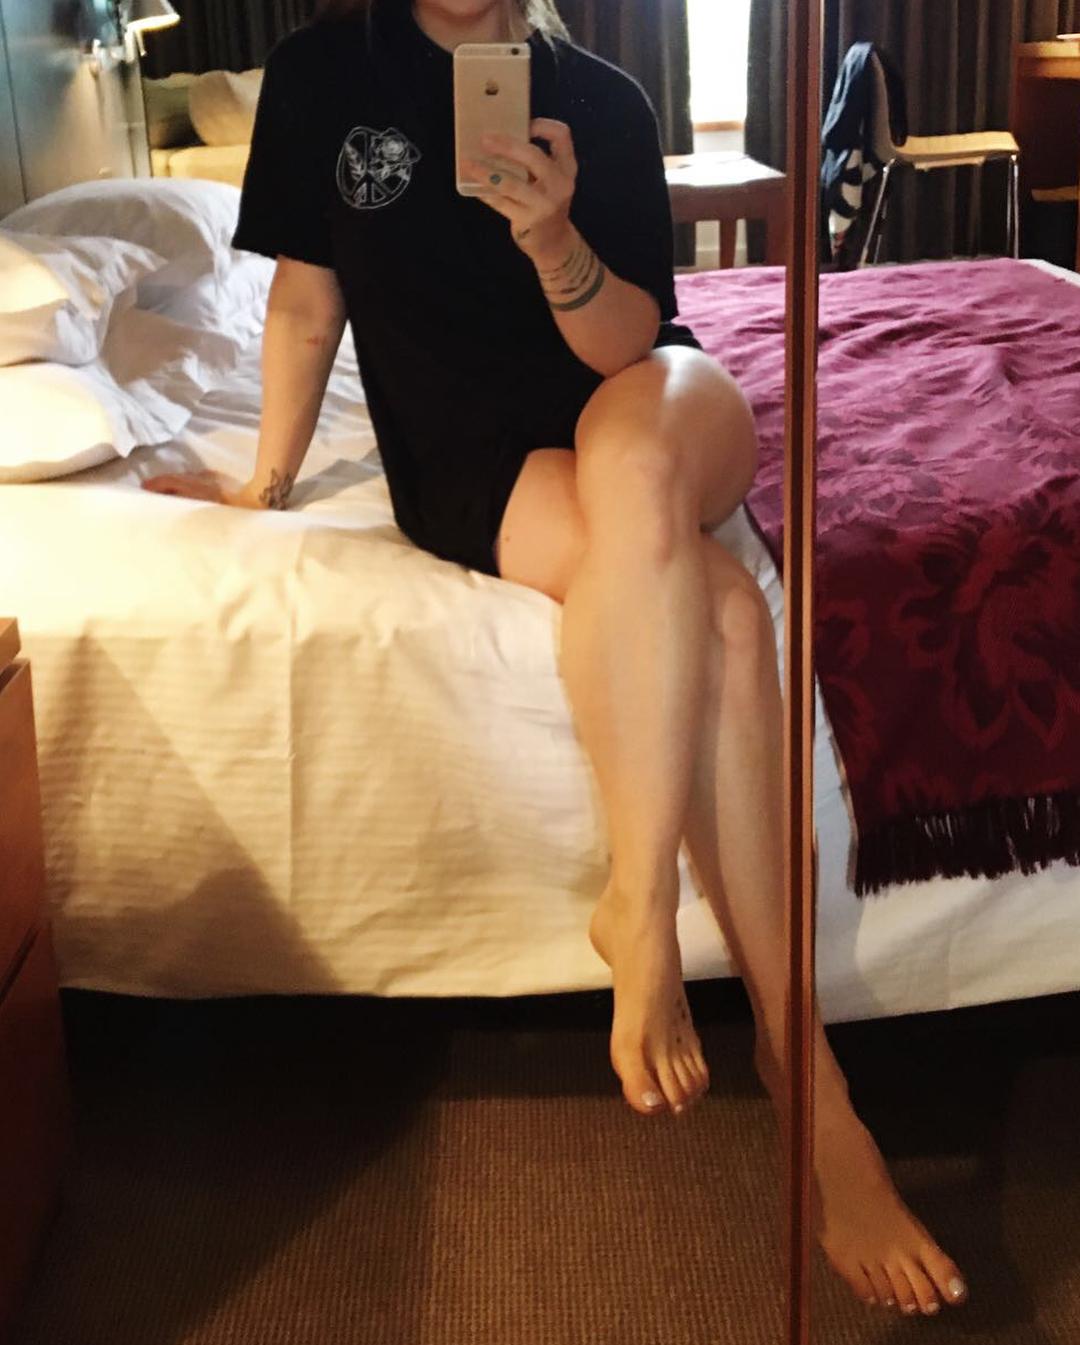 Feet Joanna JoJo Levesque nude (59 photos), Pussy, Cleavage, Selfie, cleavage 2019